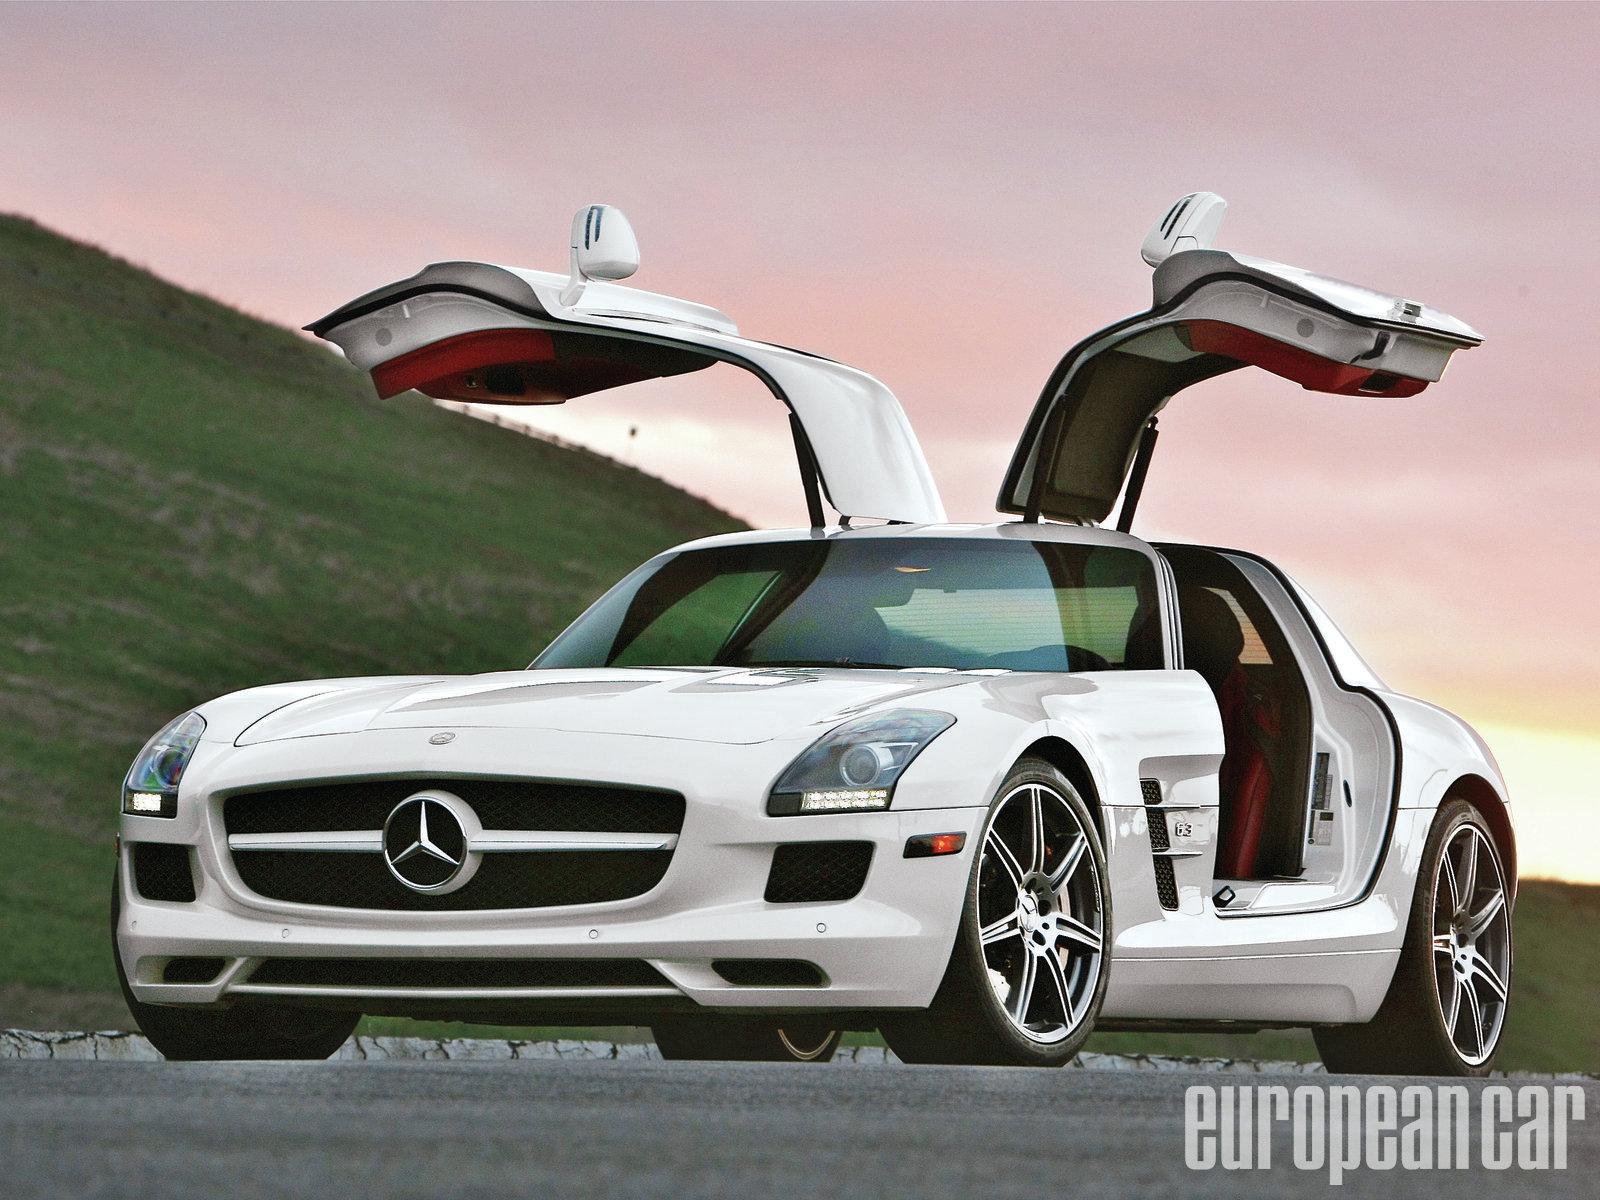 2012 Weistec Mercedes Benz SLS 750 AMG - European Car Magazine